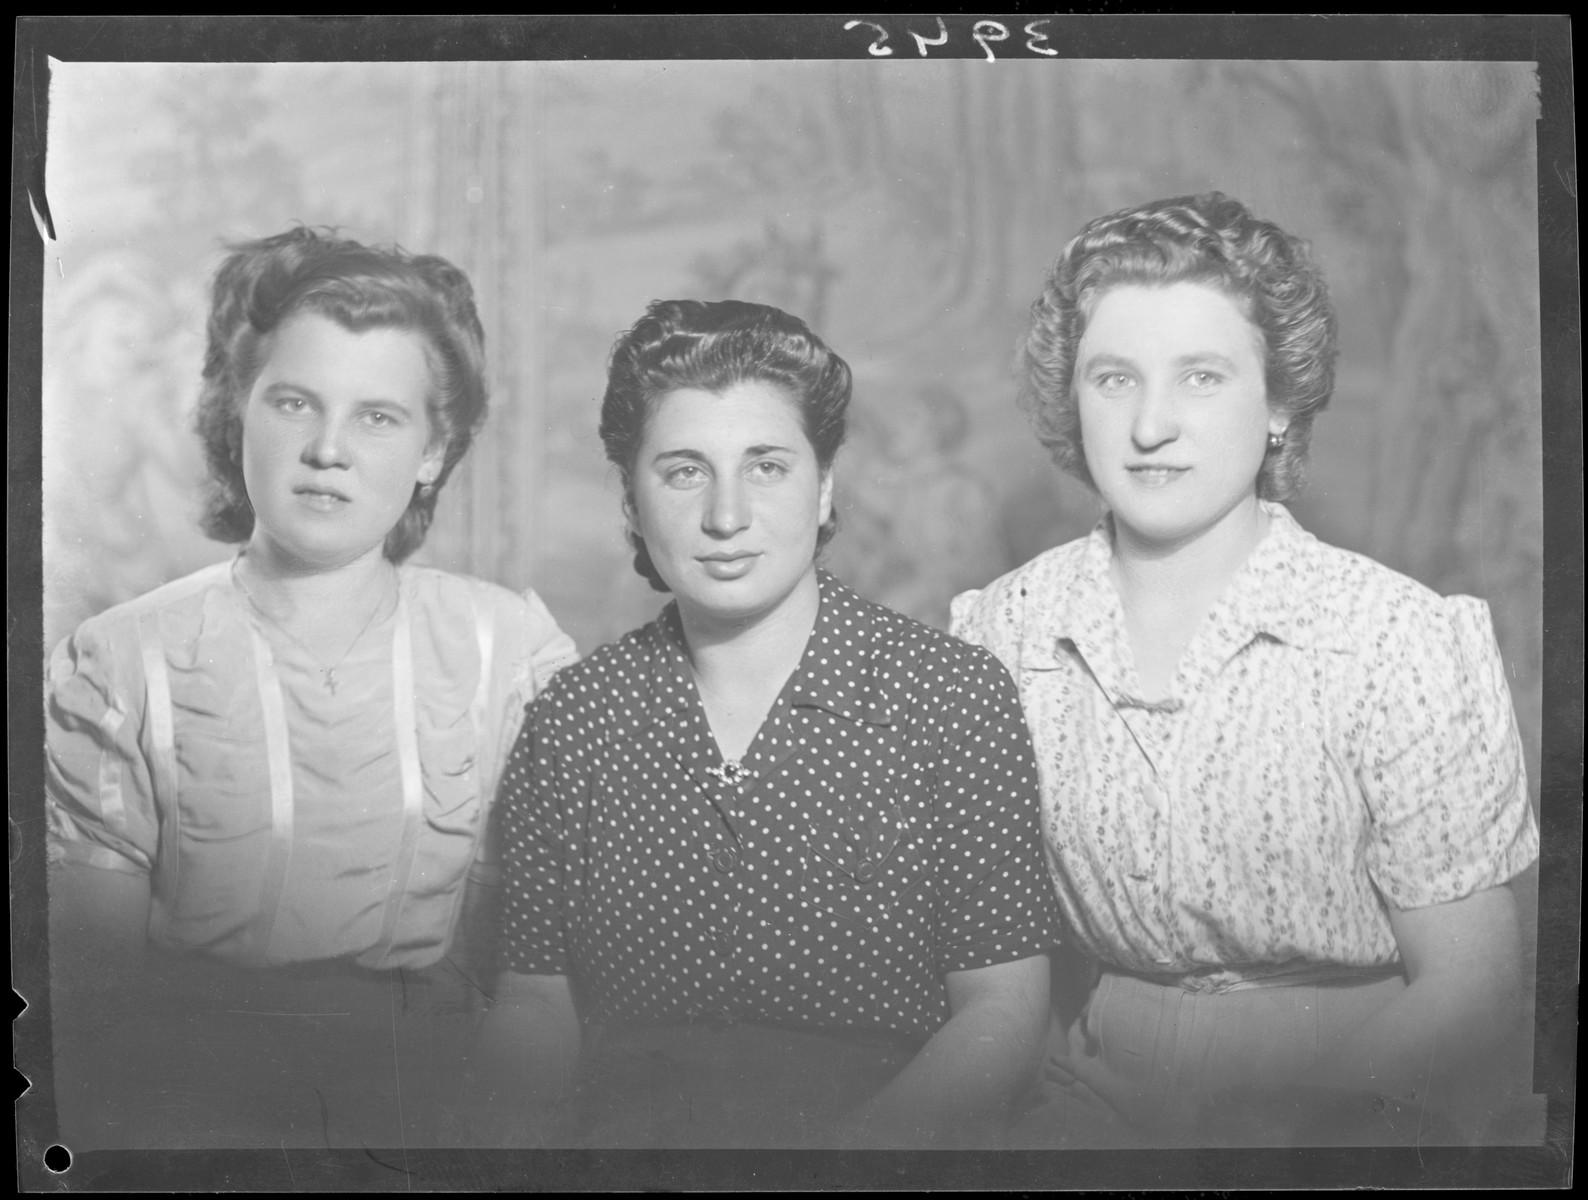 Studio portrait of Roszi Wizenfelder and two other women.